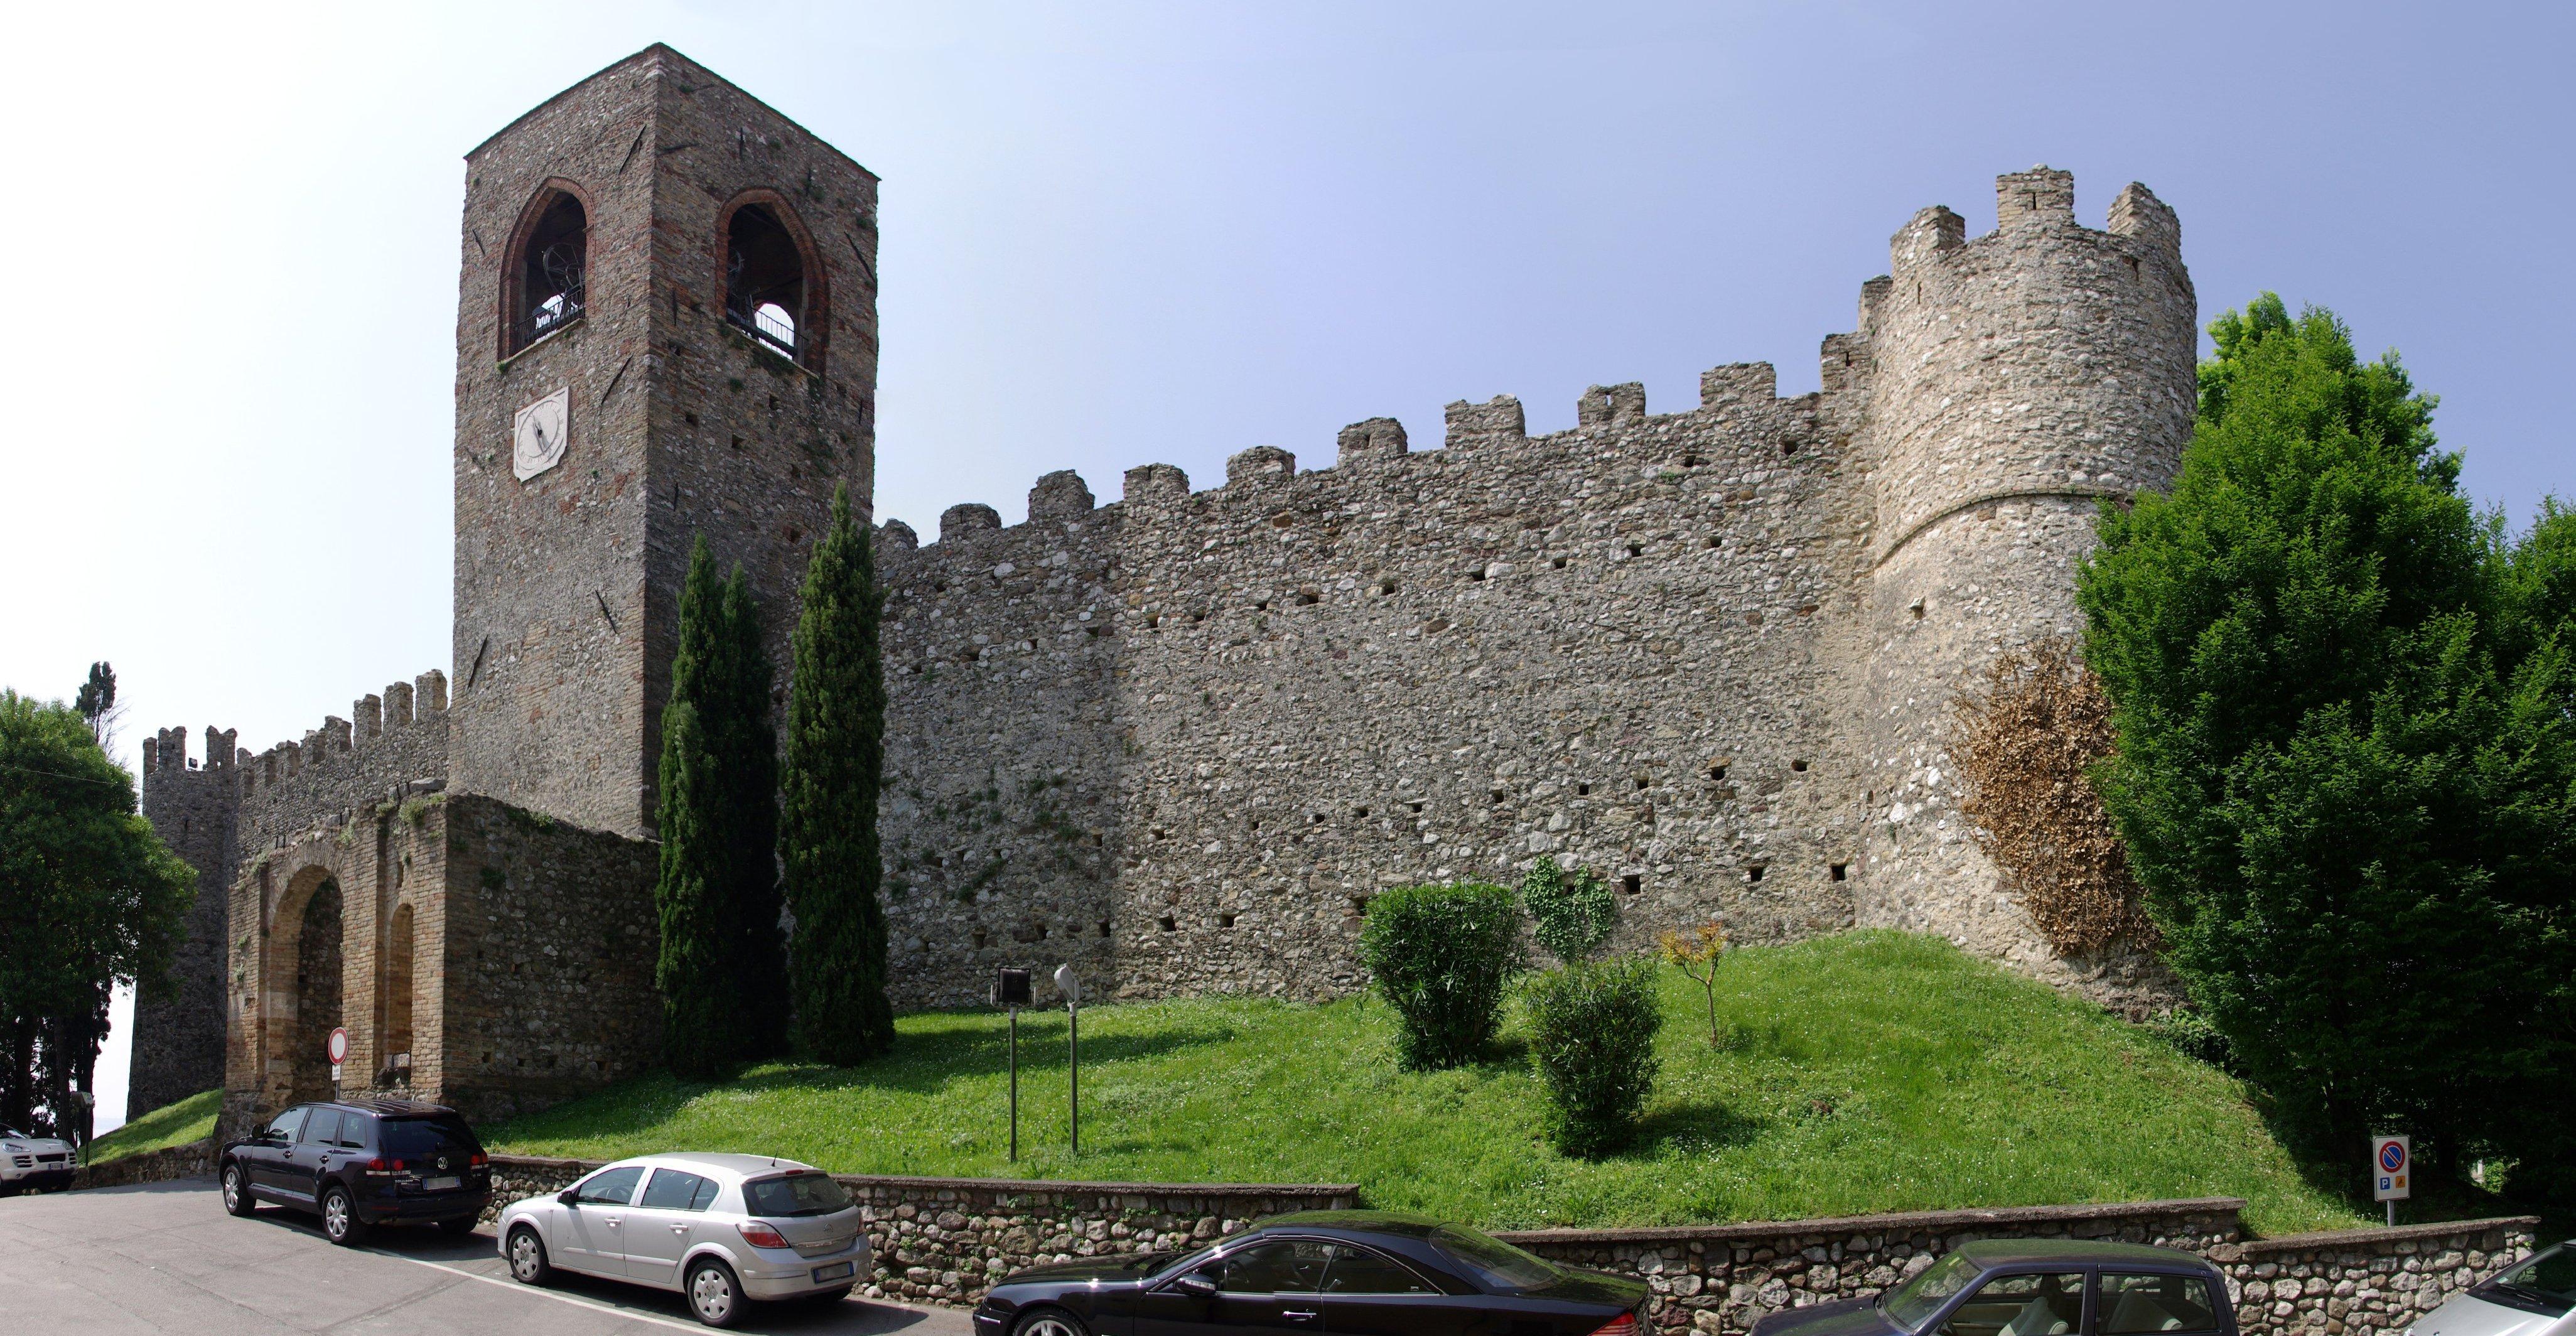 hotspots in Moniga del Garda